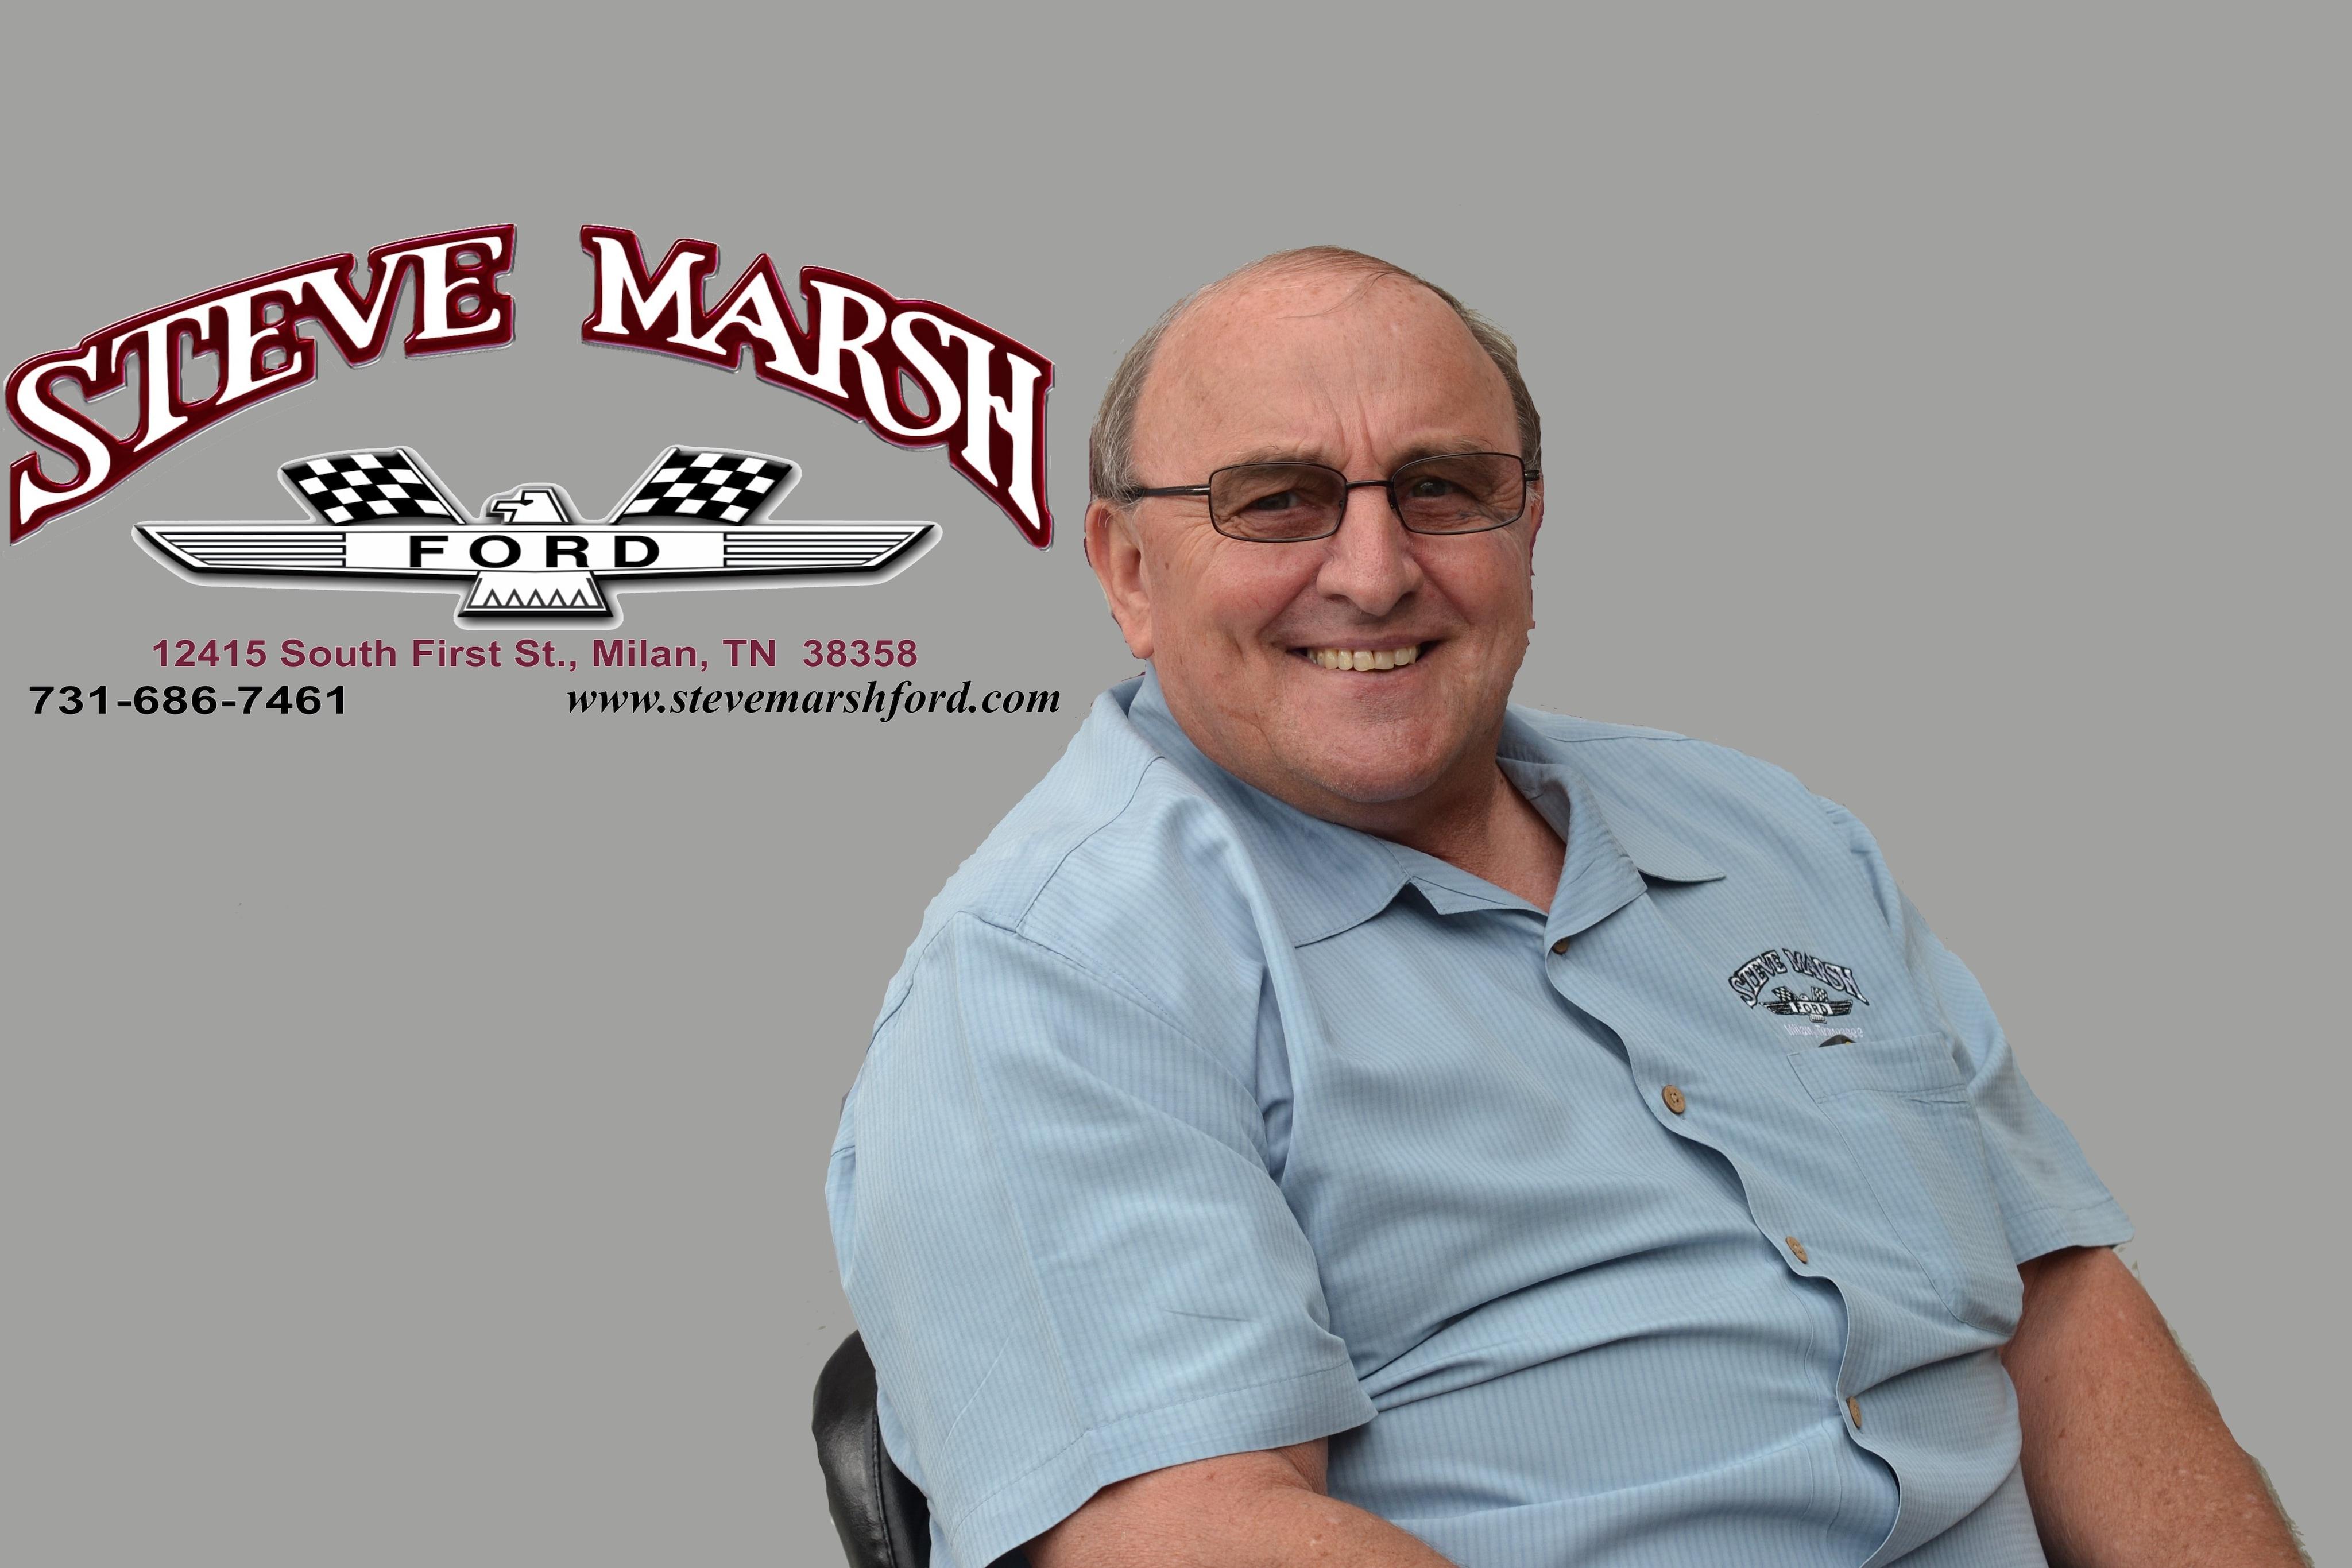 parts service staff steve marsh ford milan tn. Black Bedroom Furniture Sets. Home Design Ideas